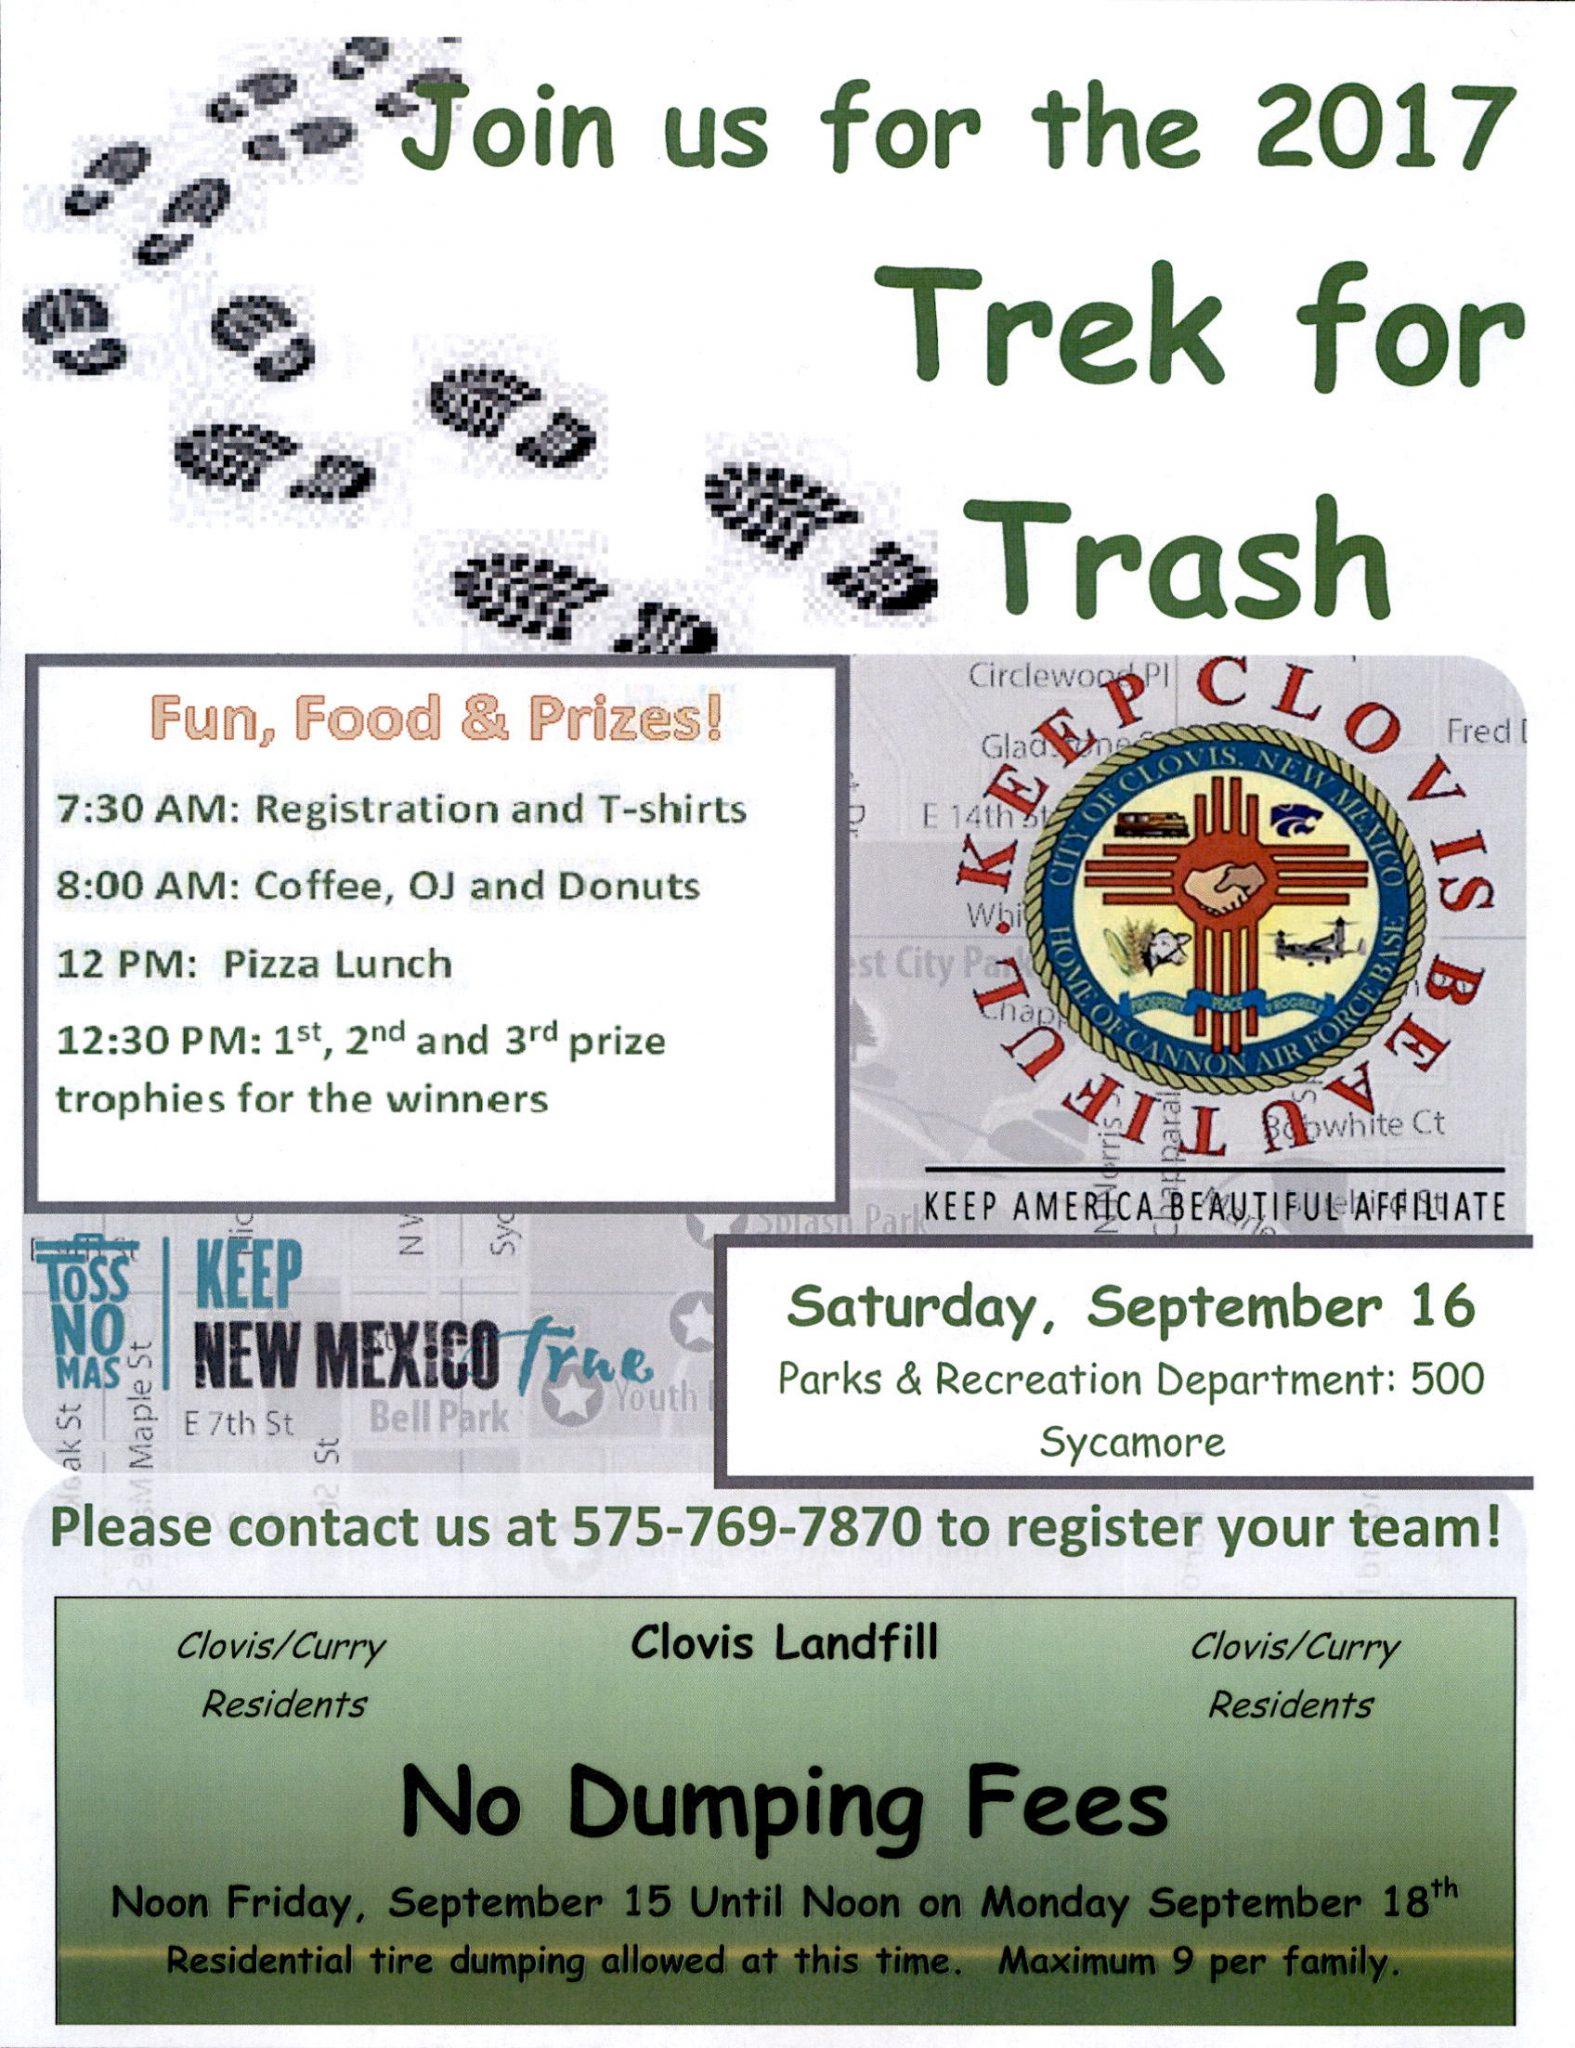 New mexico curry county clovis - Trek For Trash Saturday September 16